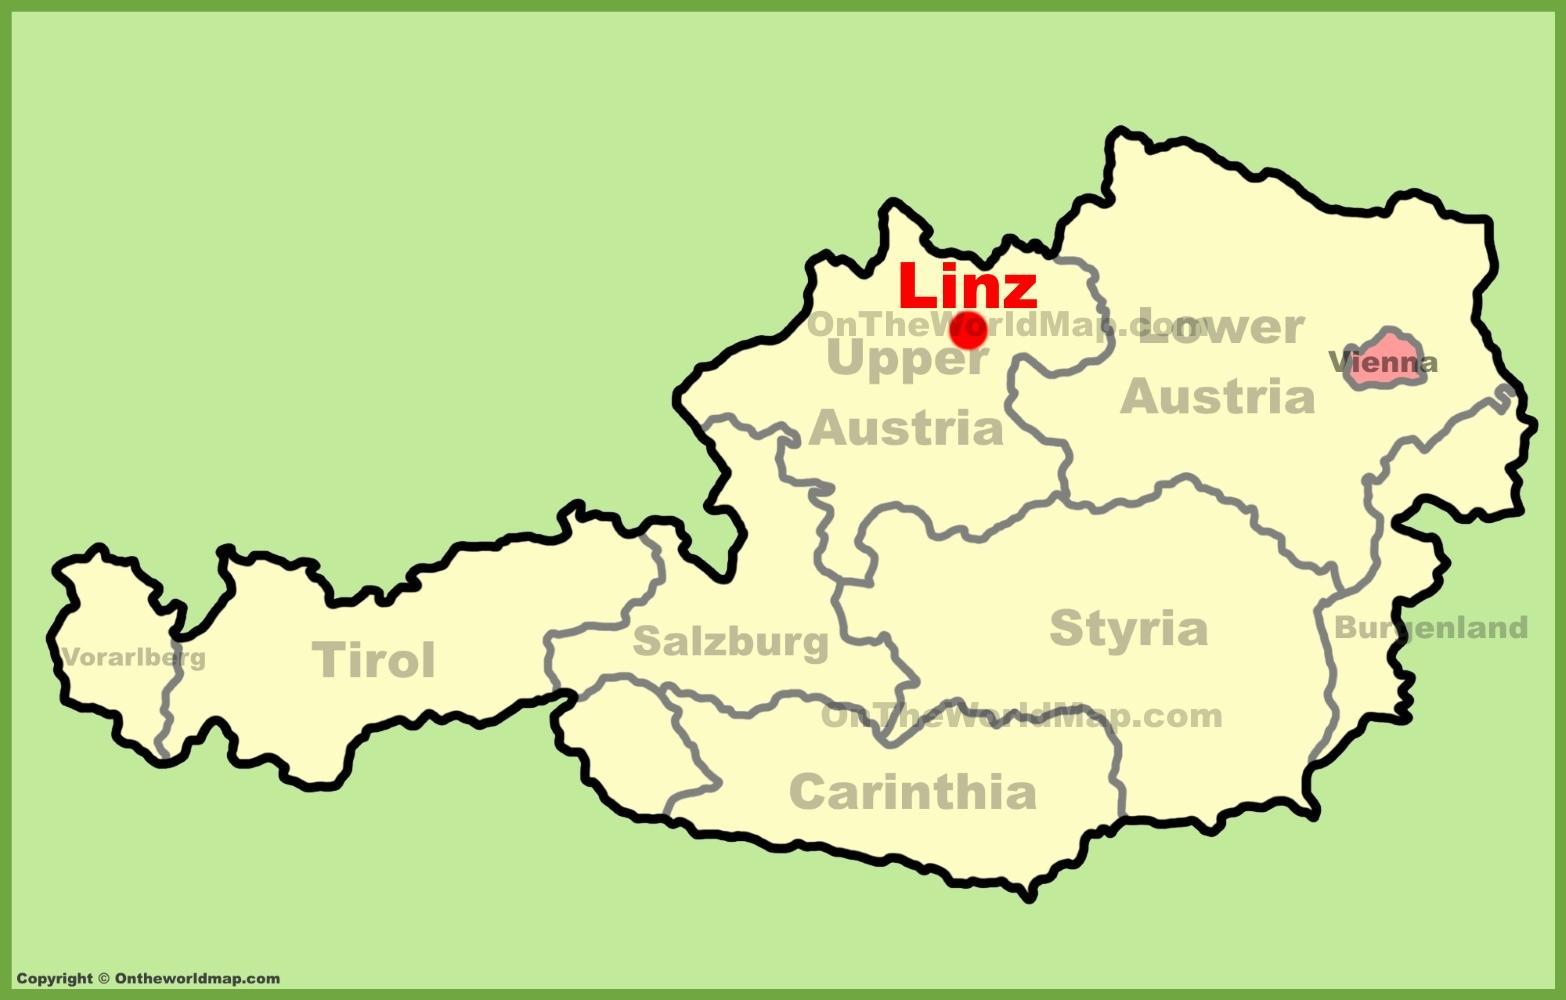 Linz Ausztria Terkep Terkep Linz Ausztria Nyugat Europaban